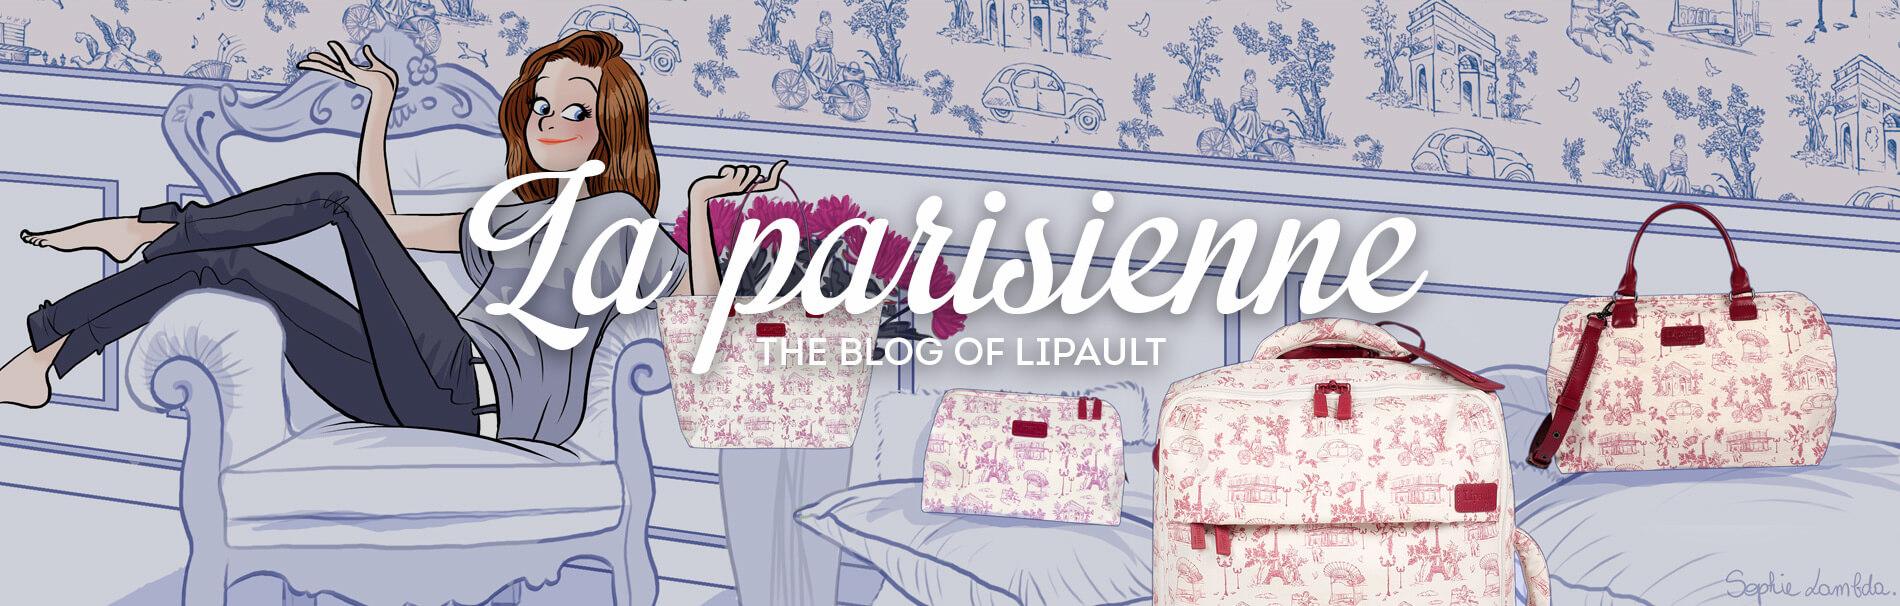 The blog of lipault